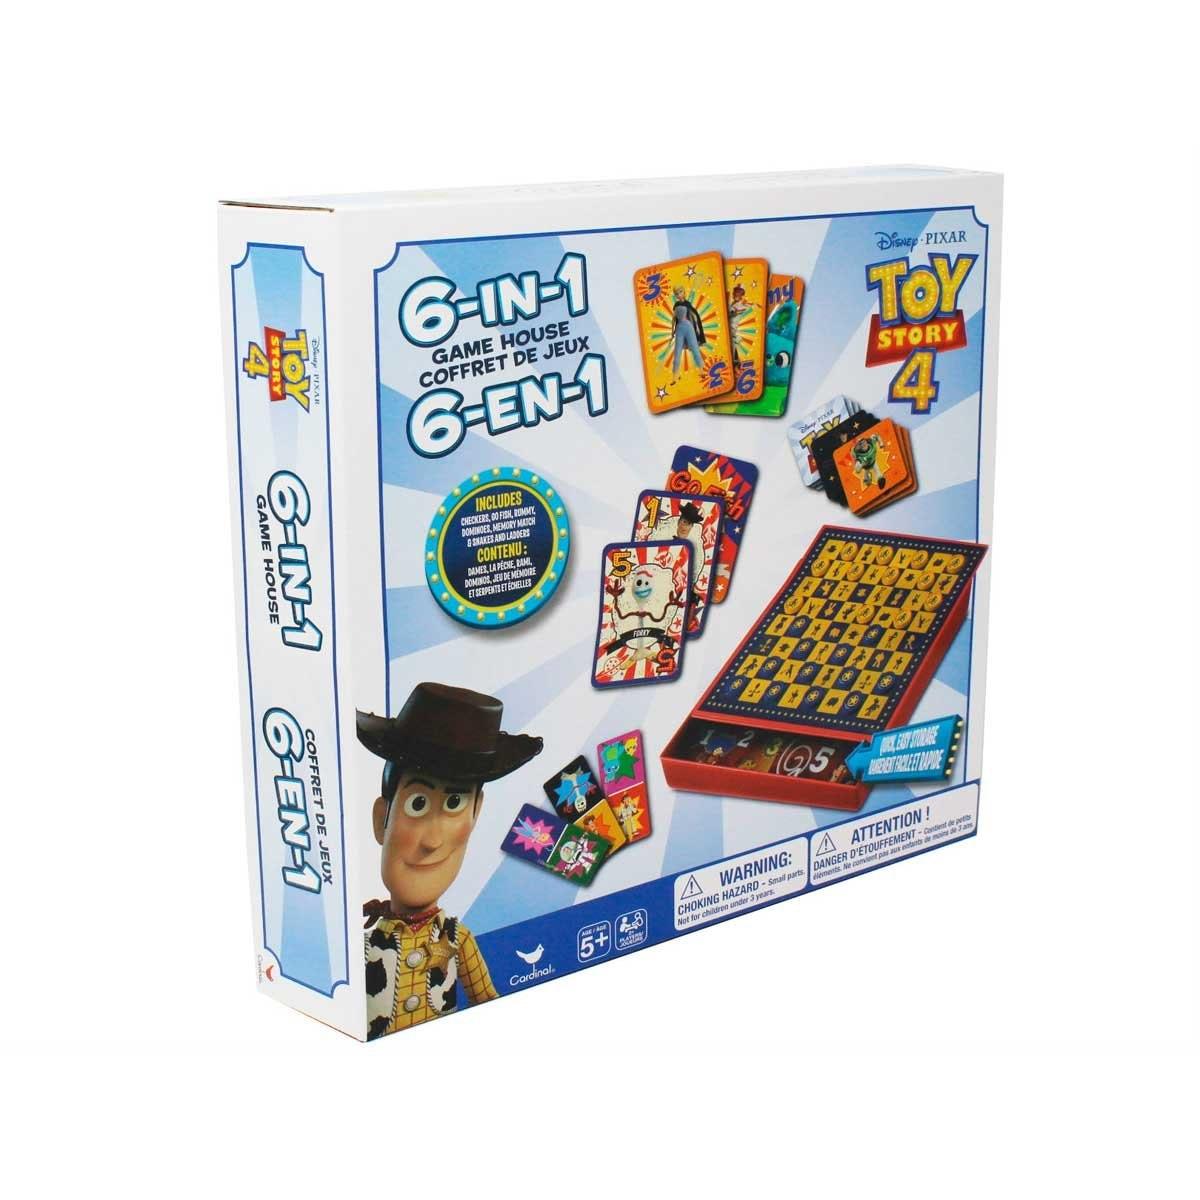 Set de Juegos Toy Story 4 Spin Master